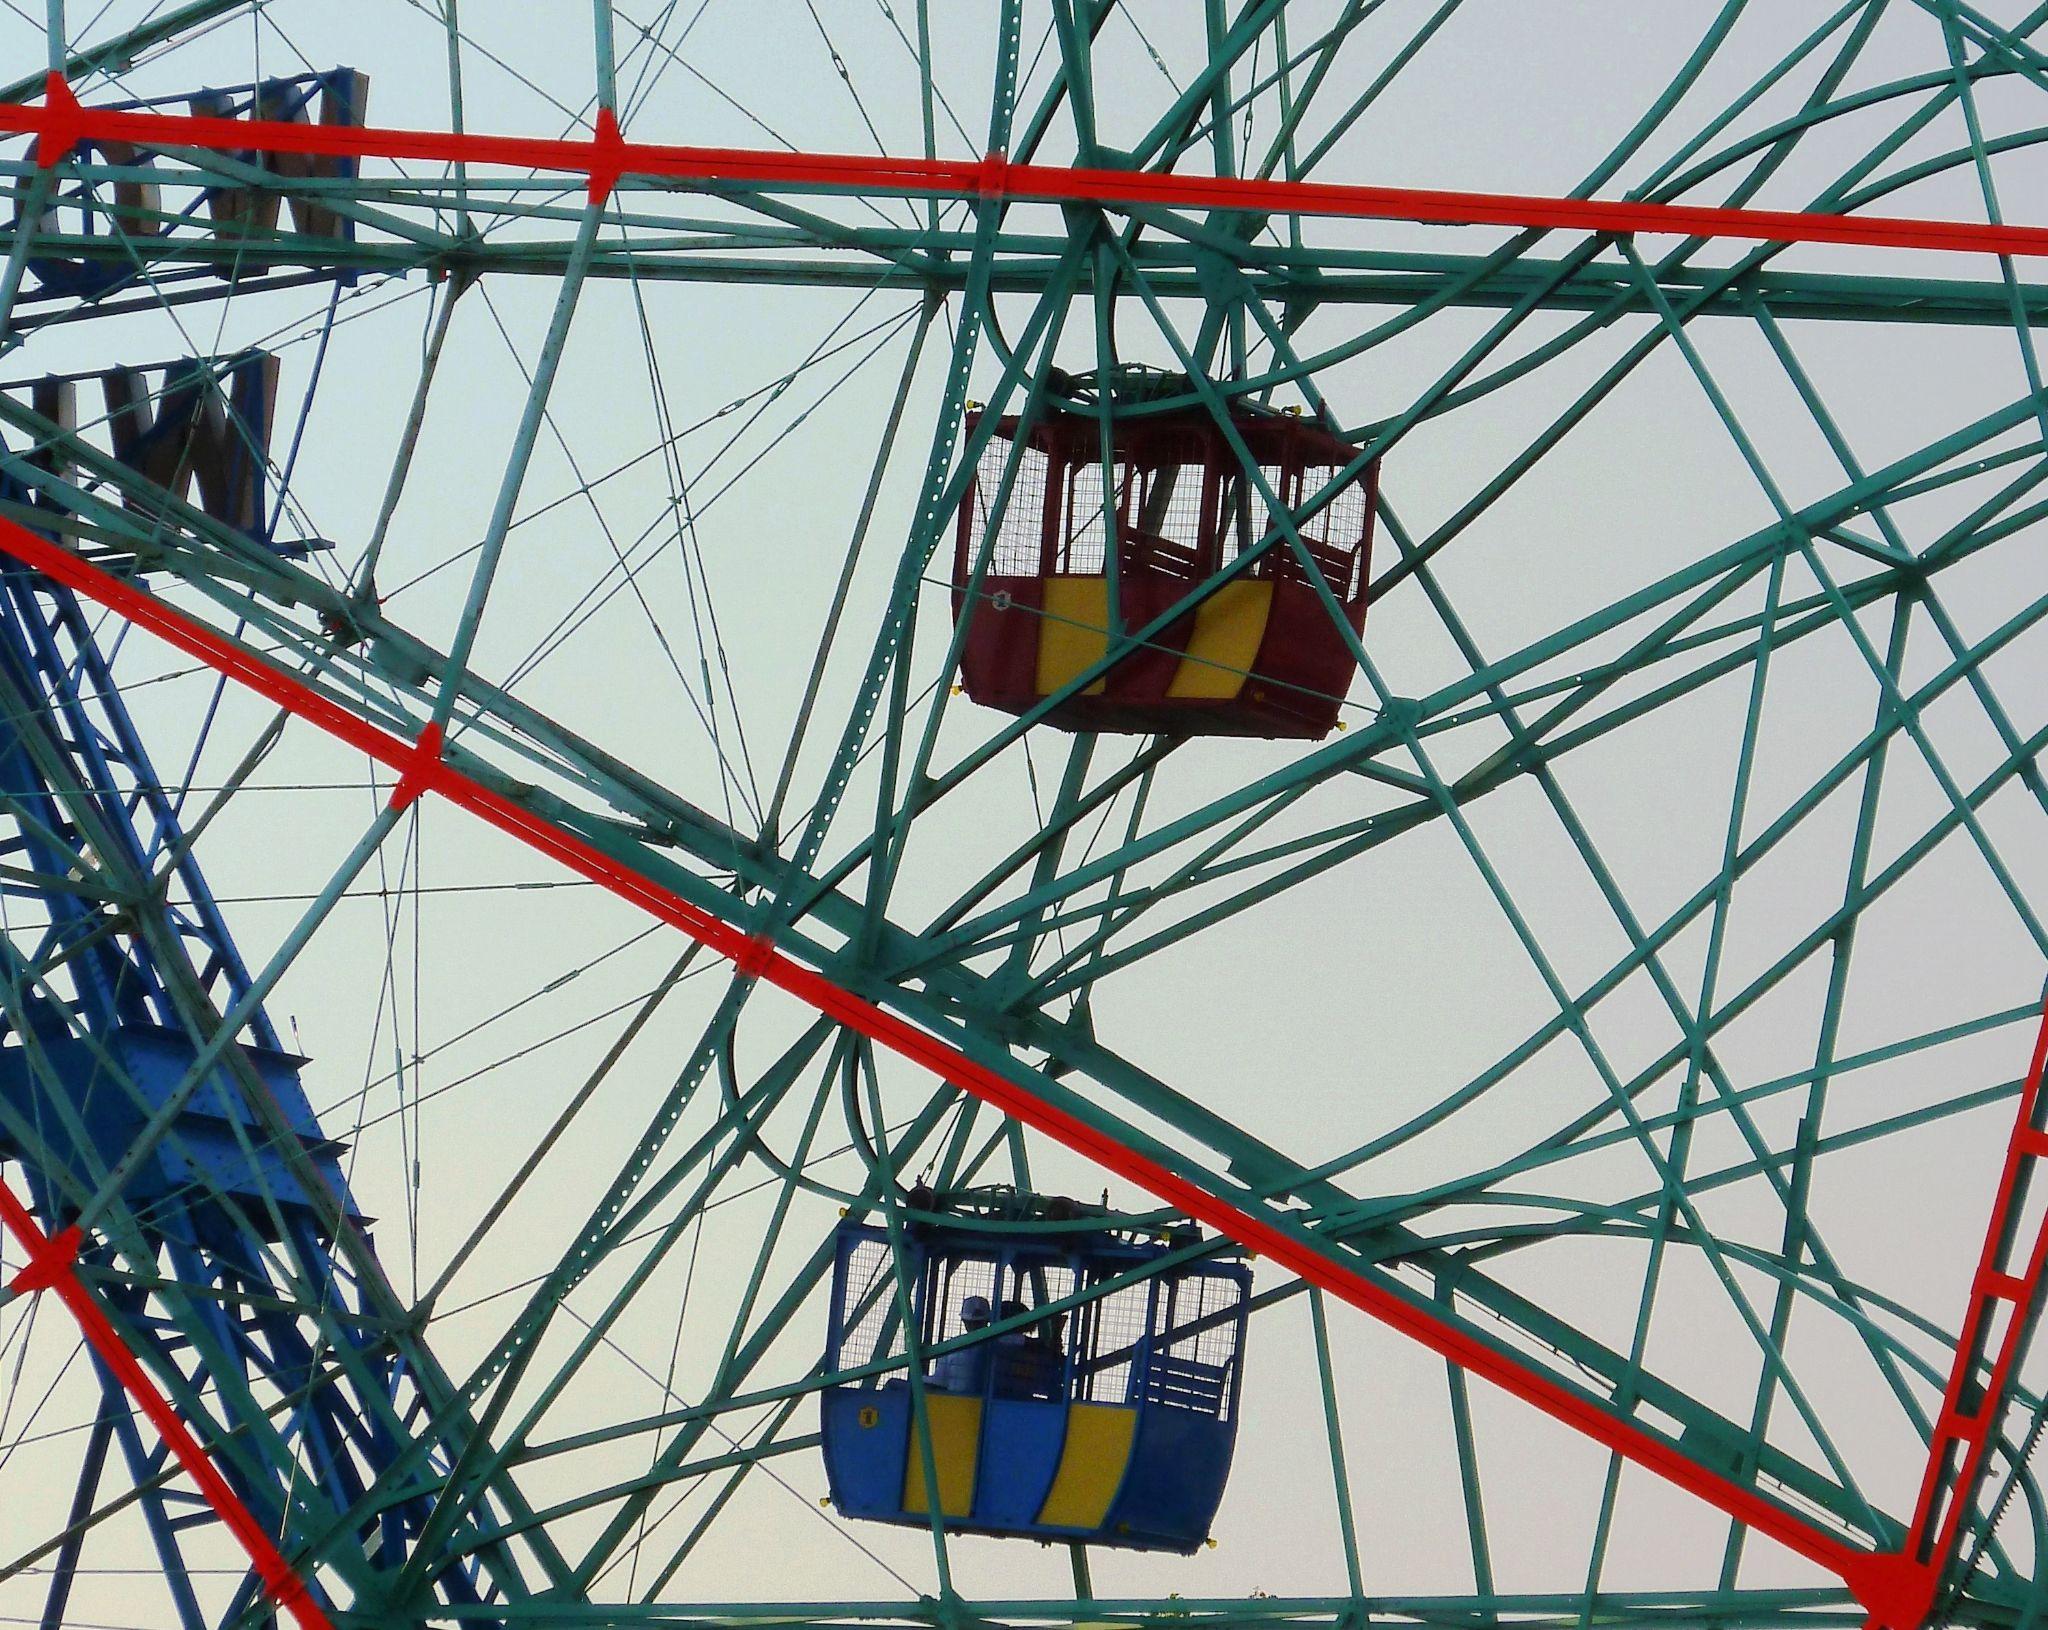 Coney Island Icon - The Wonder Wheel - 2 cars by Anton Agalbato